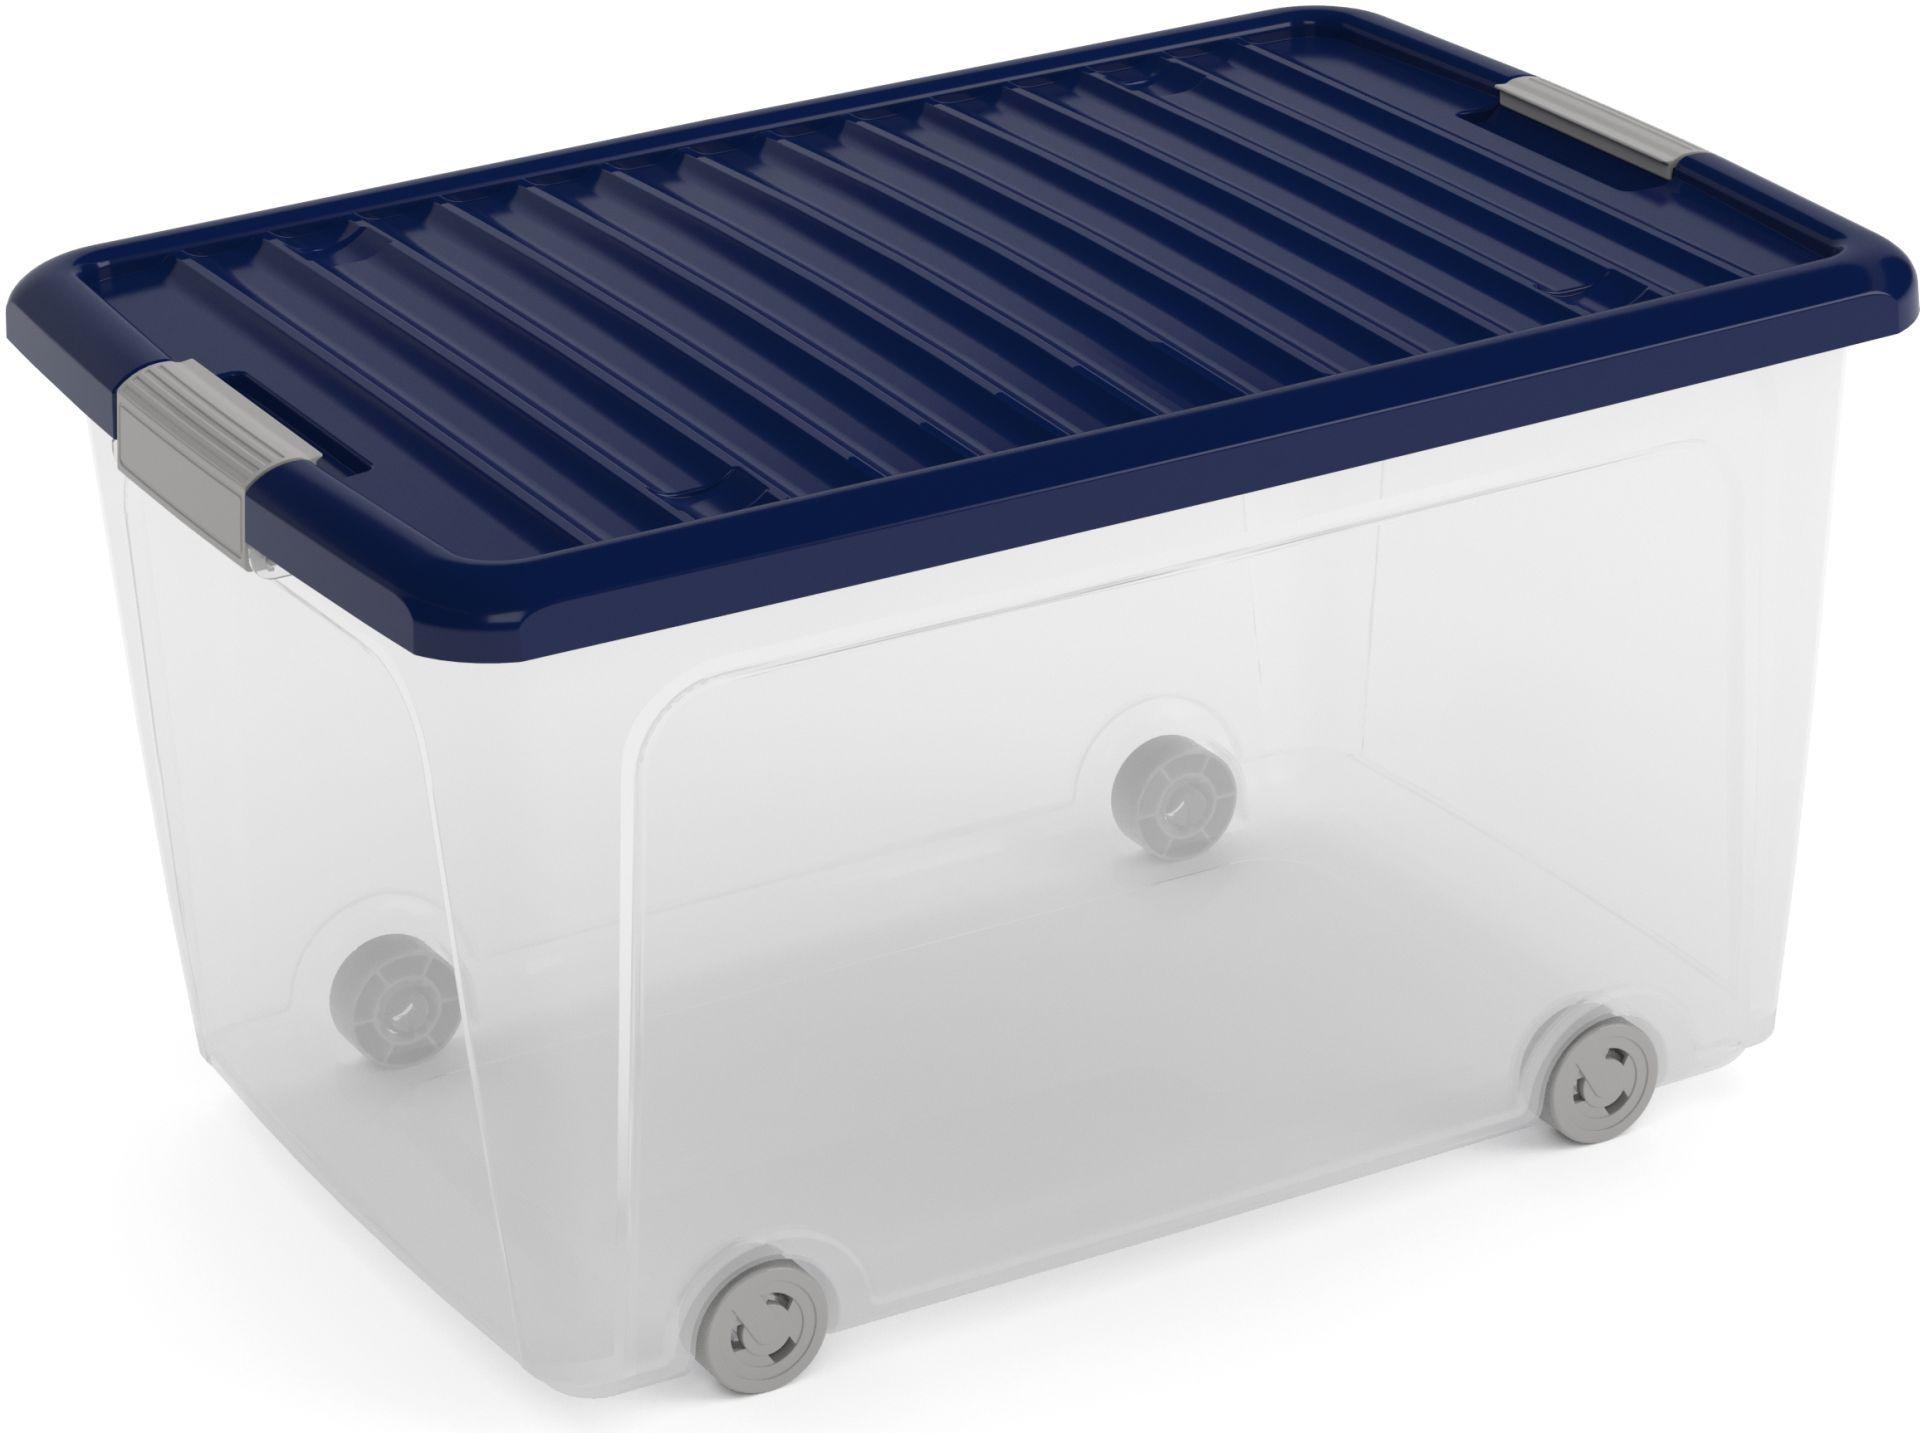 KIS W BOX L 50L 59x39x32cm transparent/modrá indigo